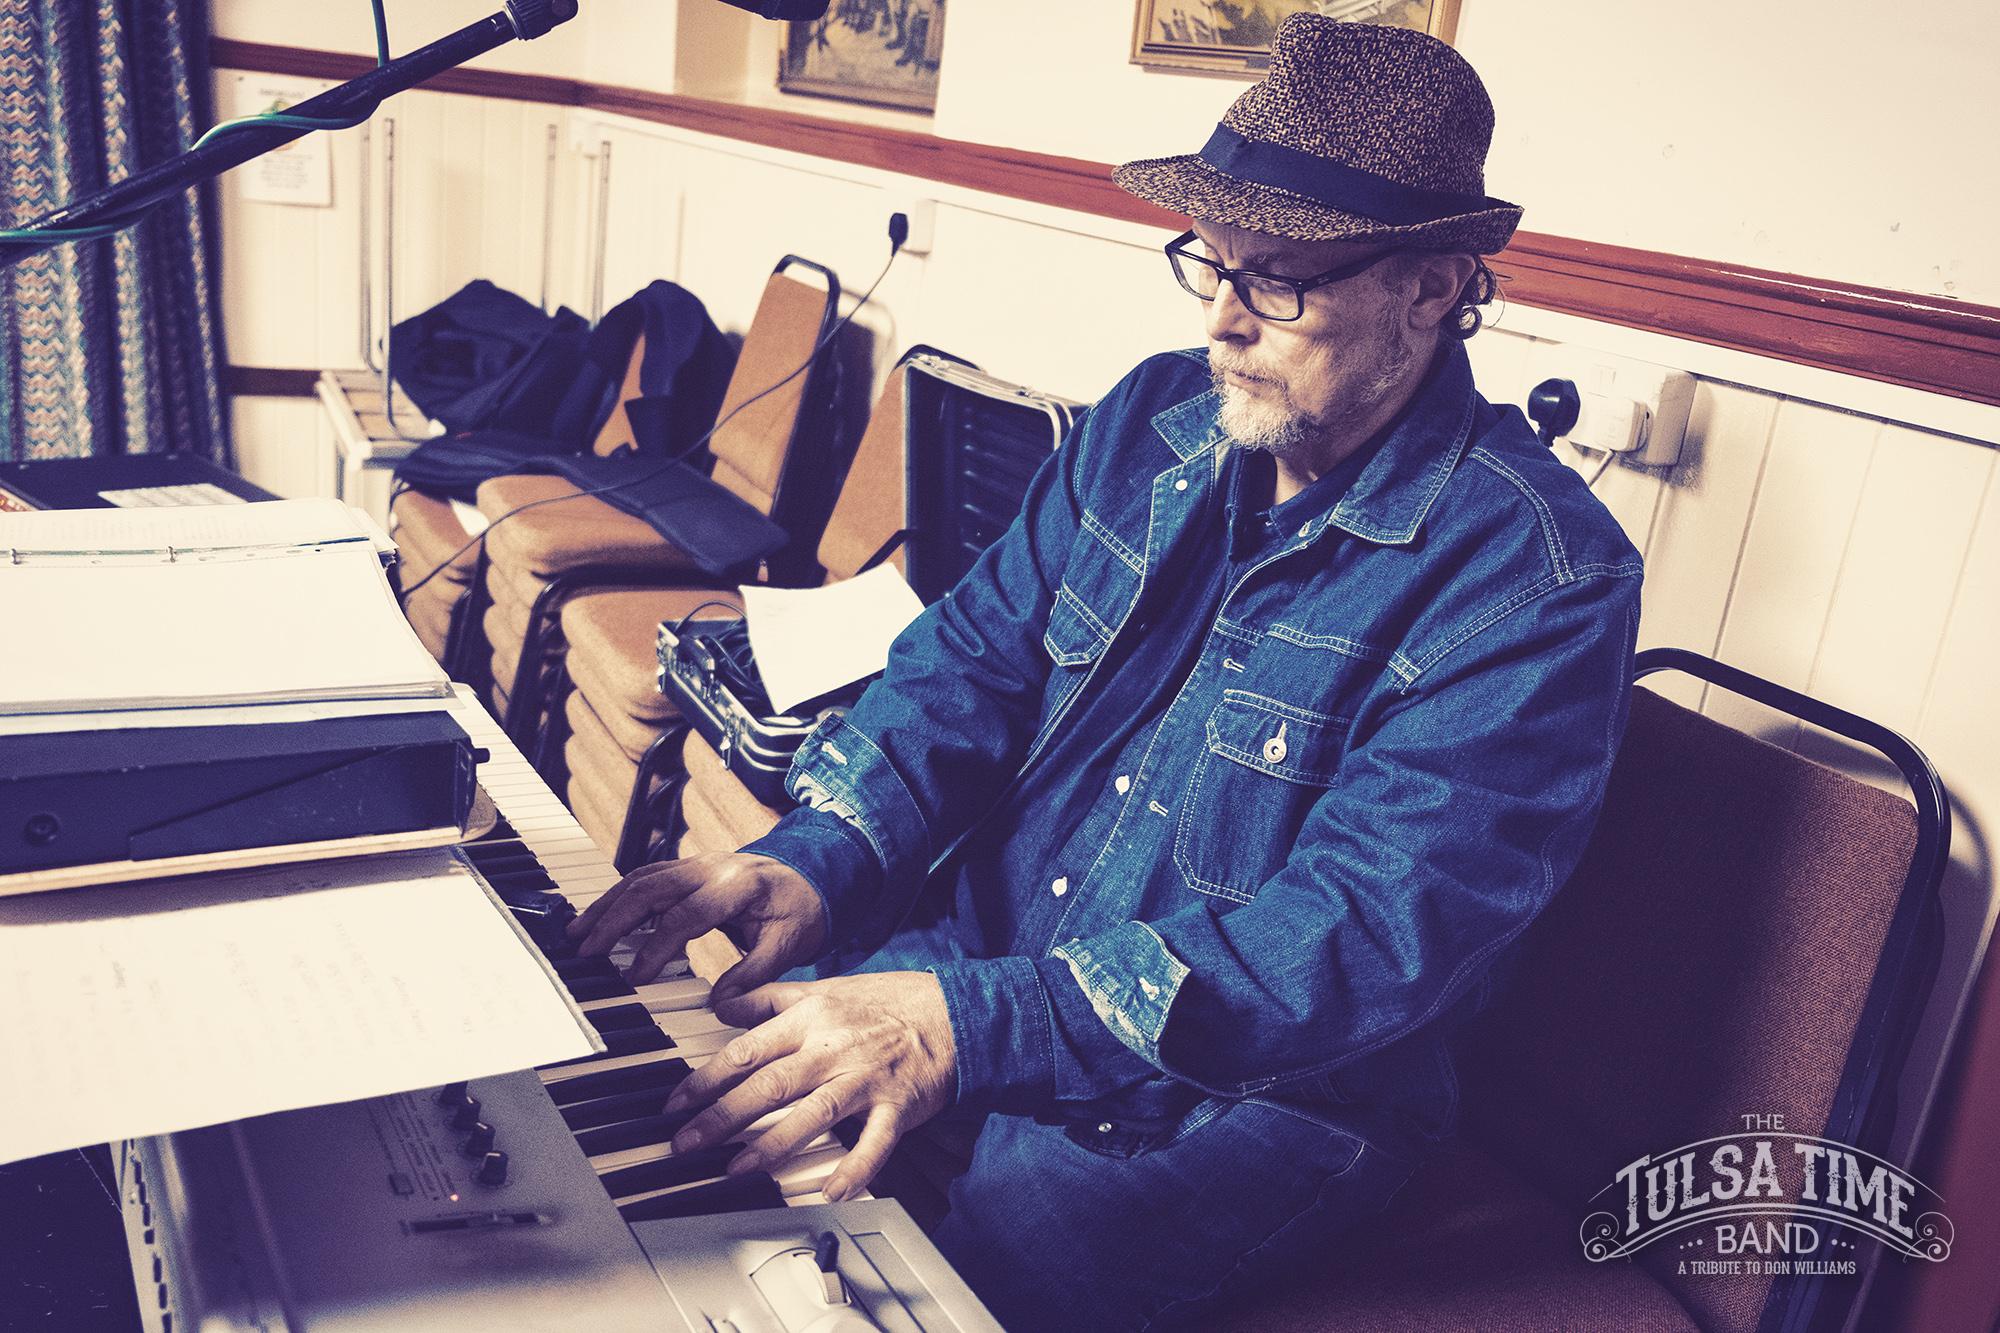 TulsaTimeBand Promo WEB Pix 0119-WestMoors-Rehersal-22.jpg